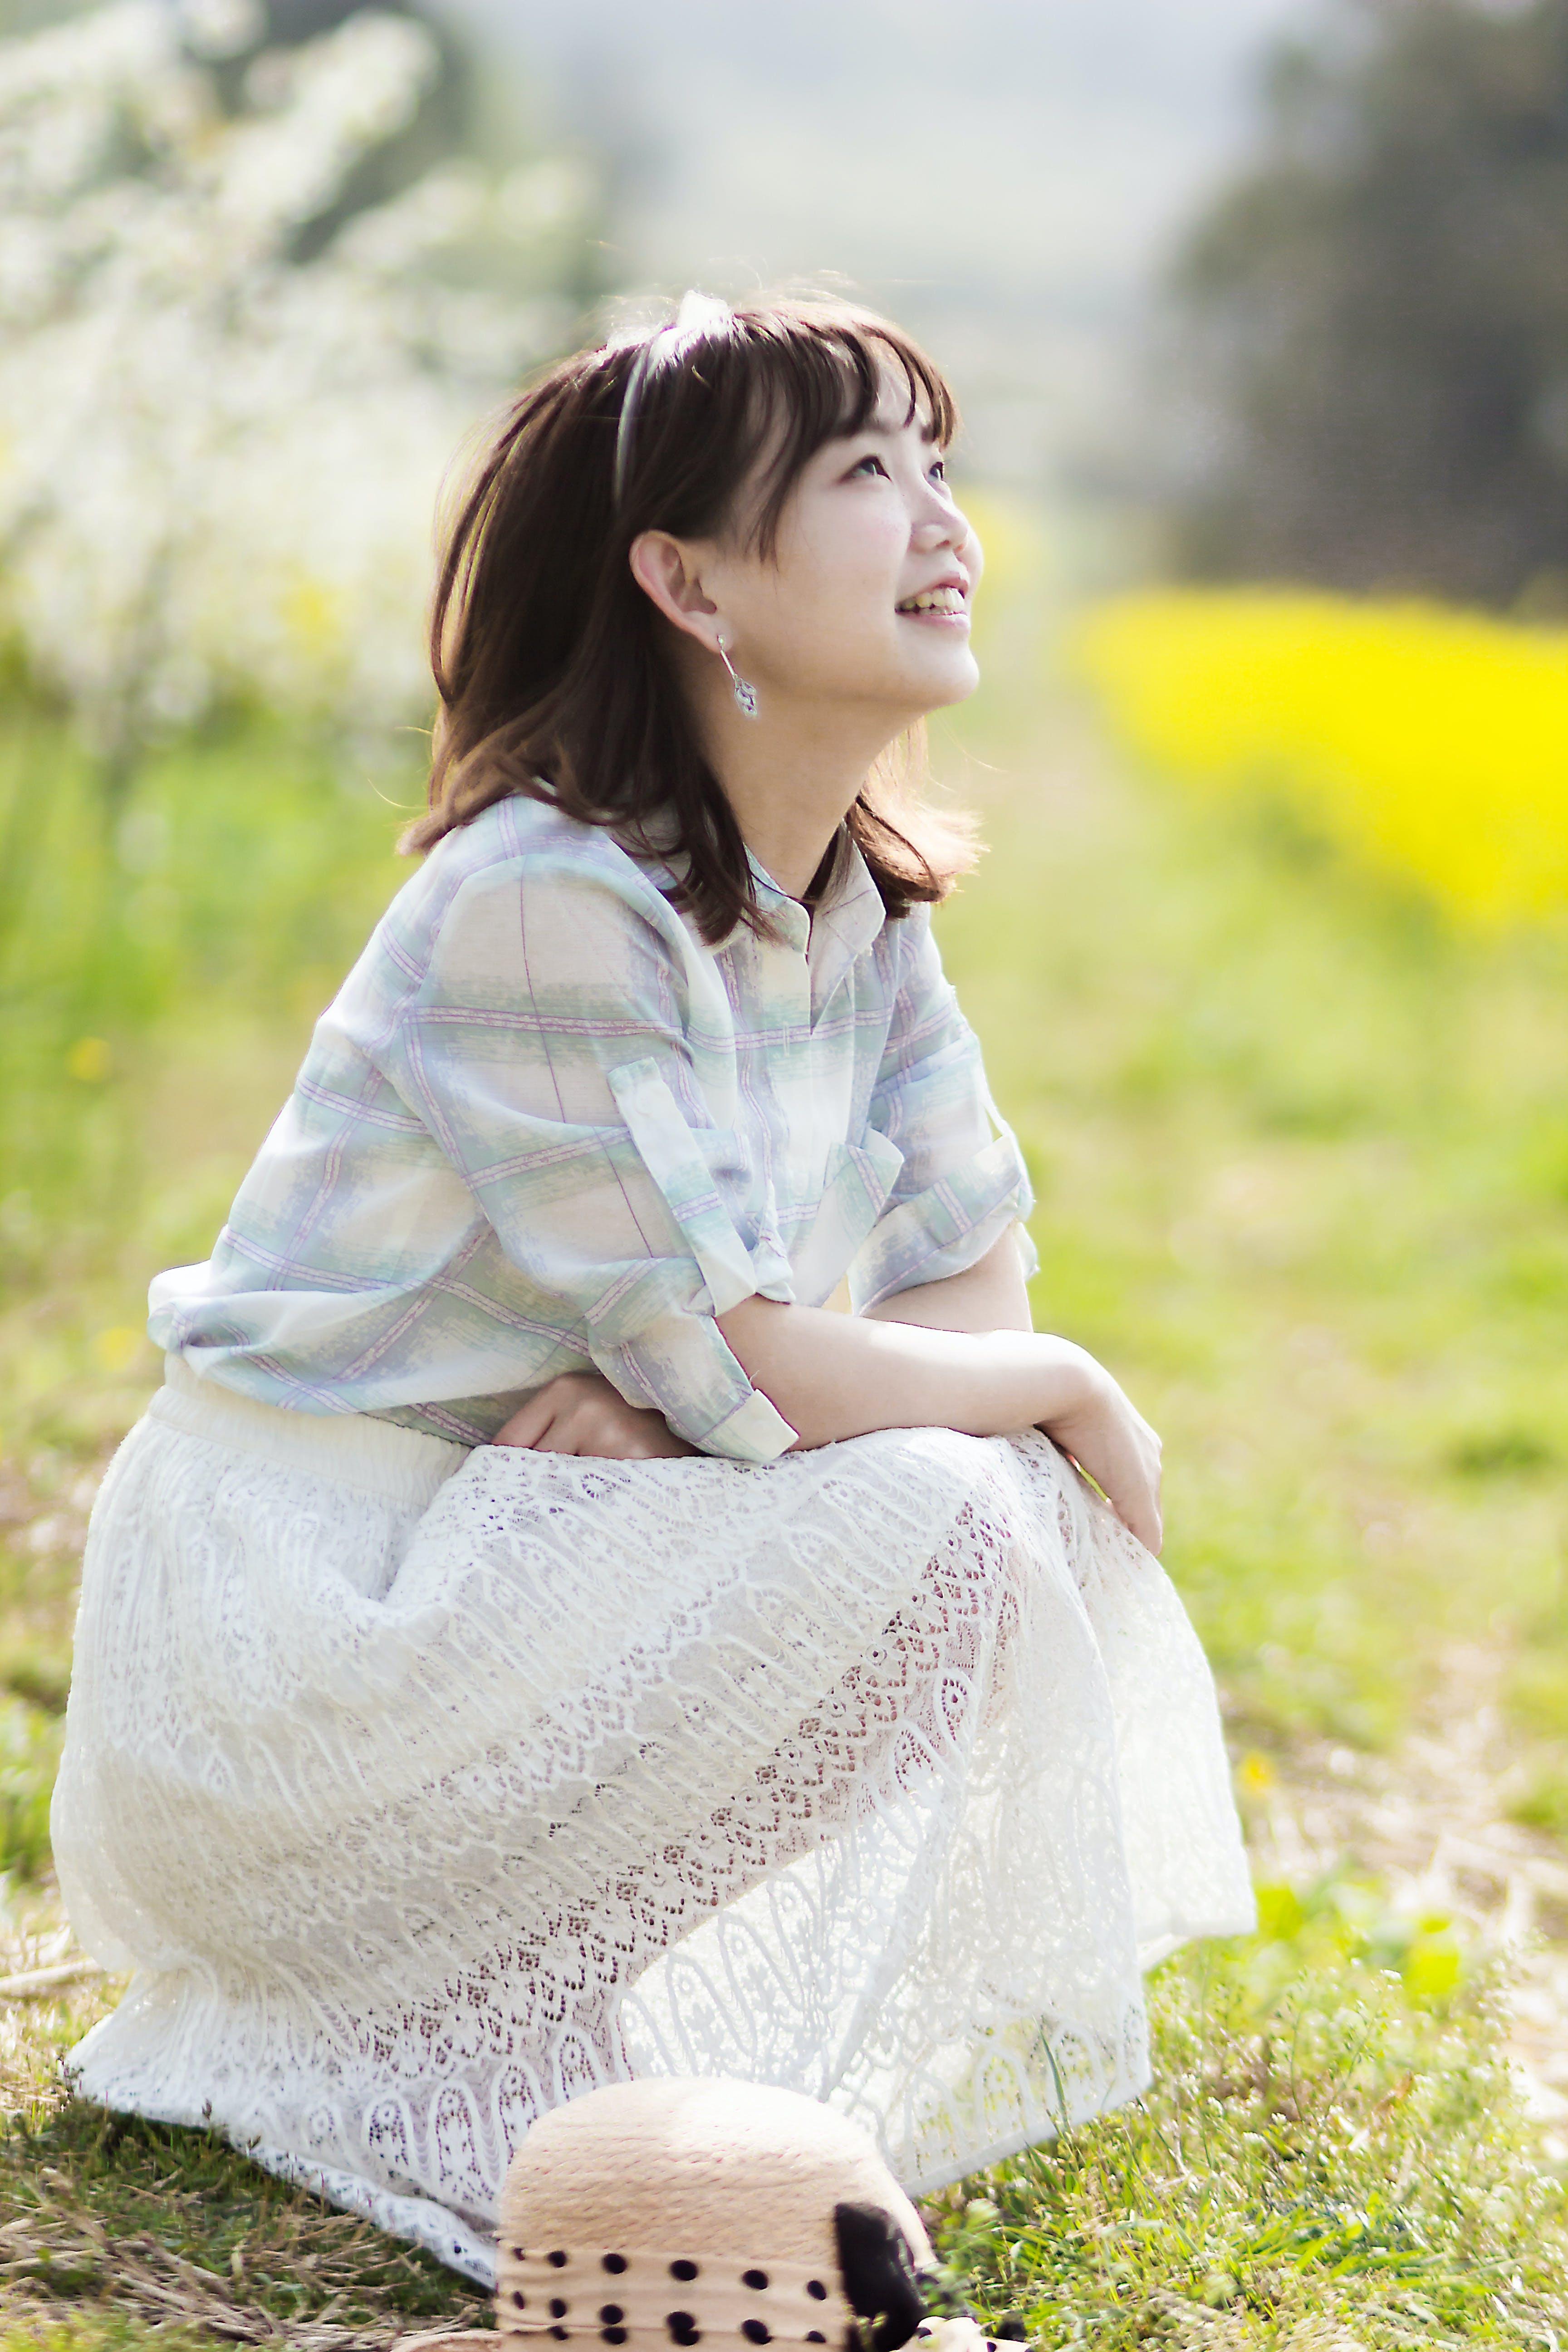 Woman Sitting Near Grass